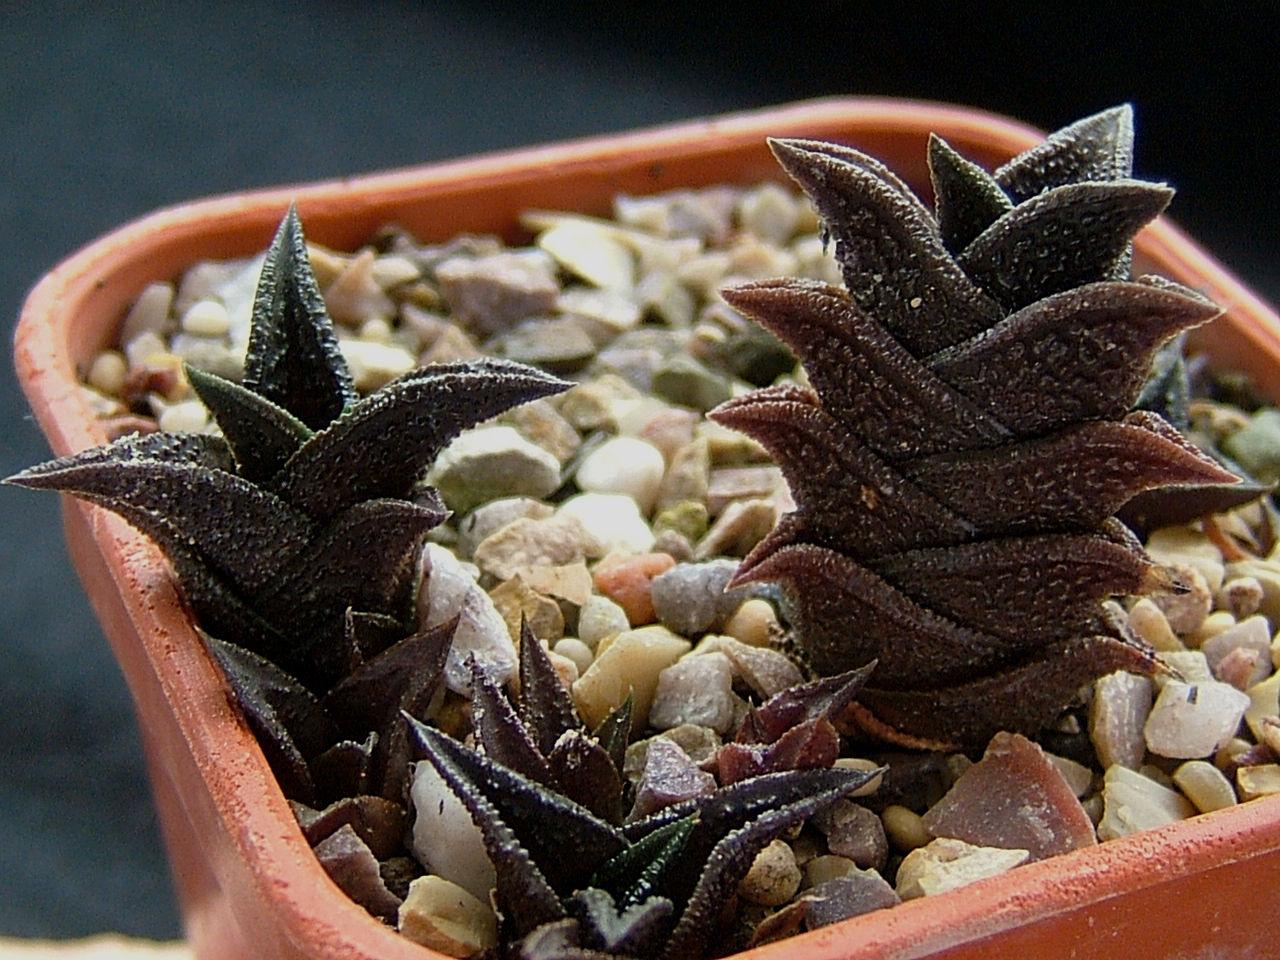 Haworthia nigra - typical form